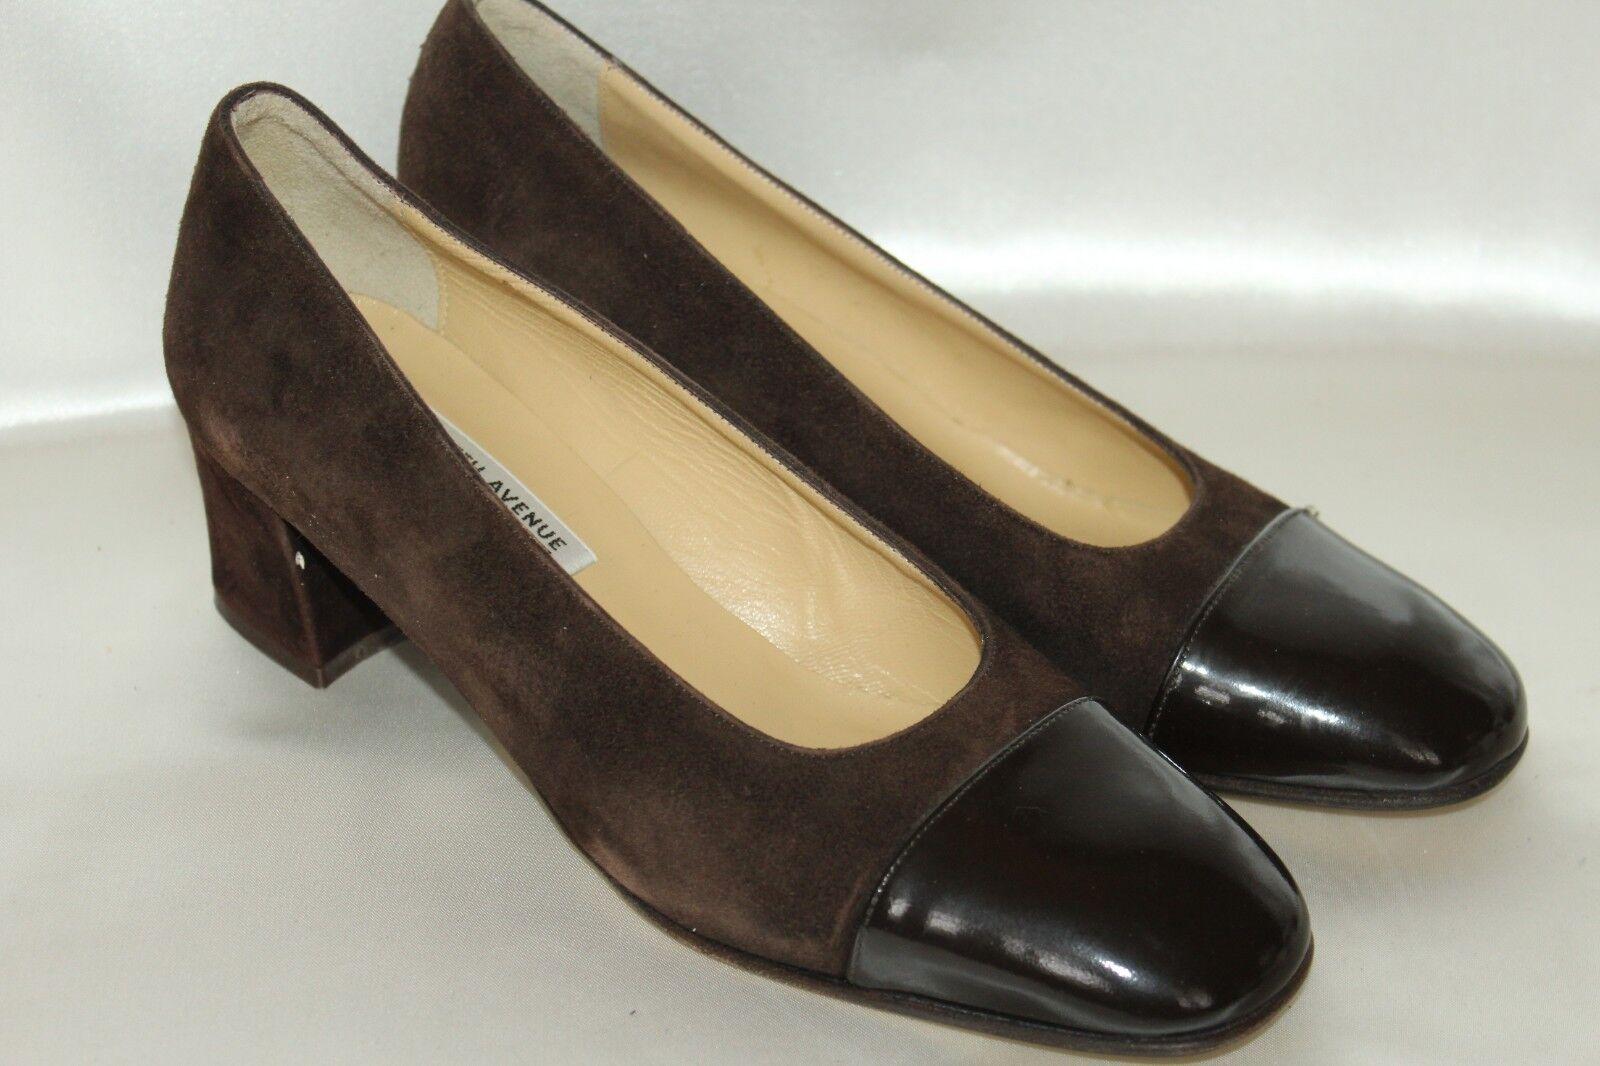 Saks Fifth Avenue Chocolate Dk Brown Suede Patent Cap Toe Heels Pumps Sz 7 ITALY